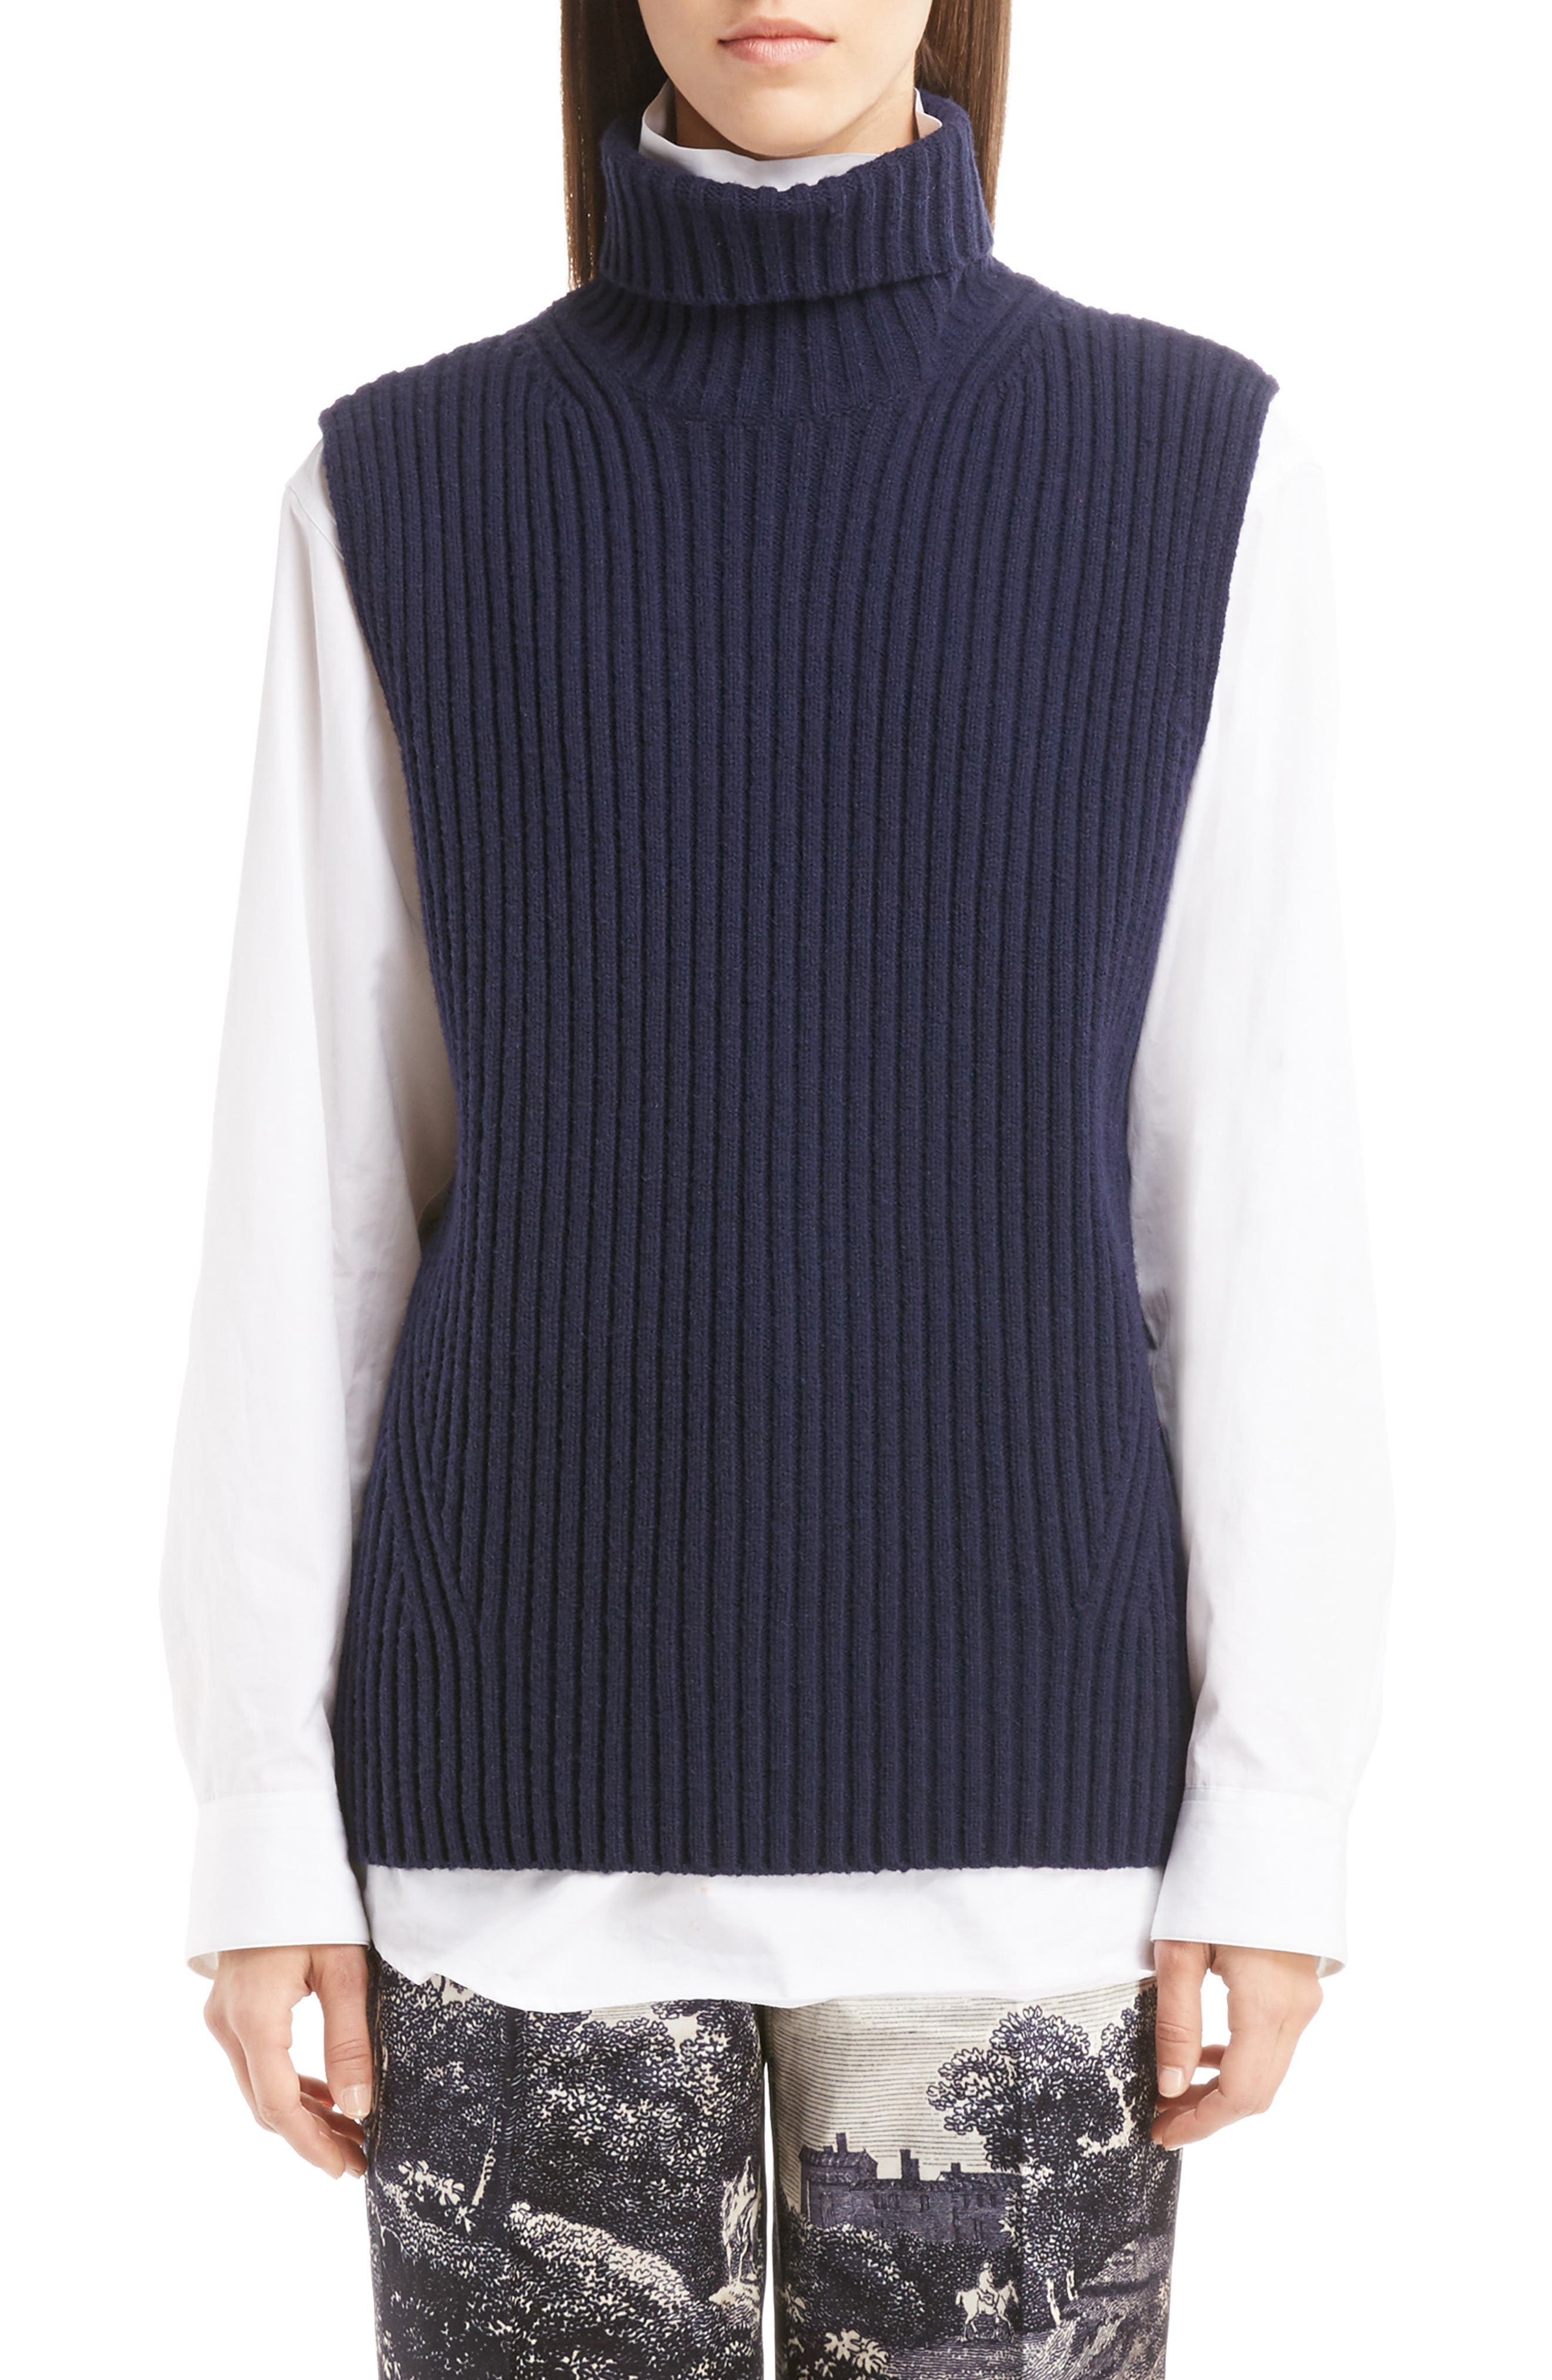 Main Image - Dries Van Noten Sleeveless Turtleneck Sweater